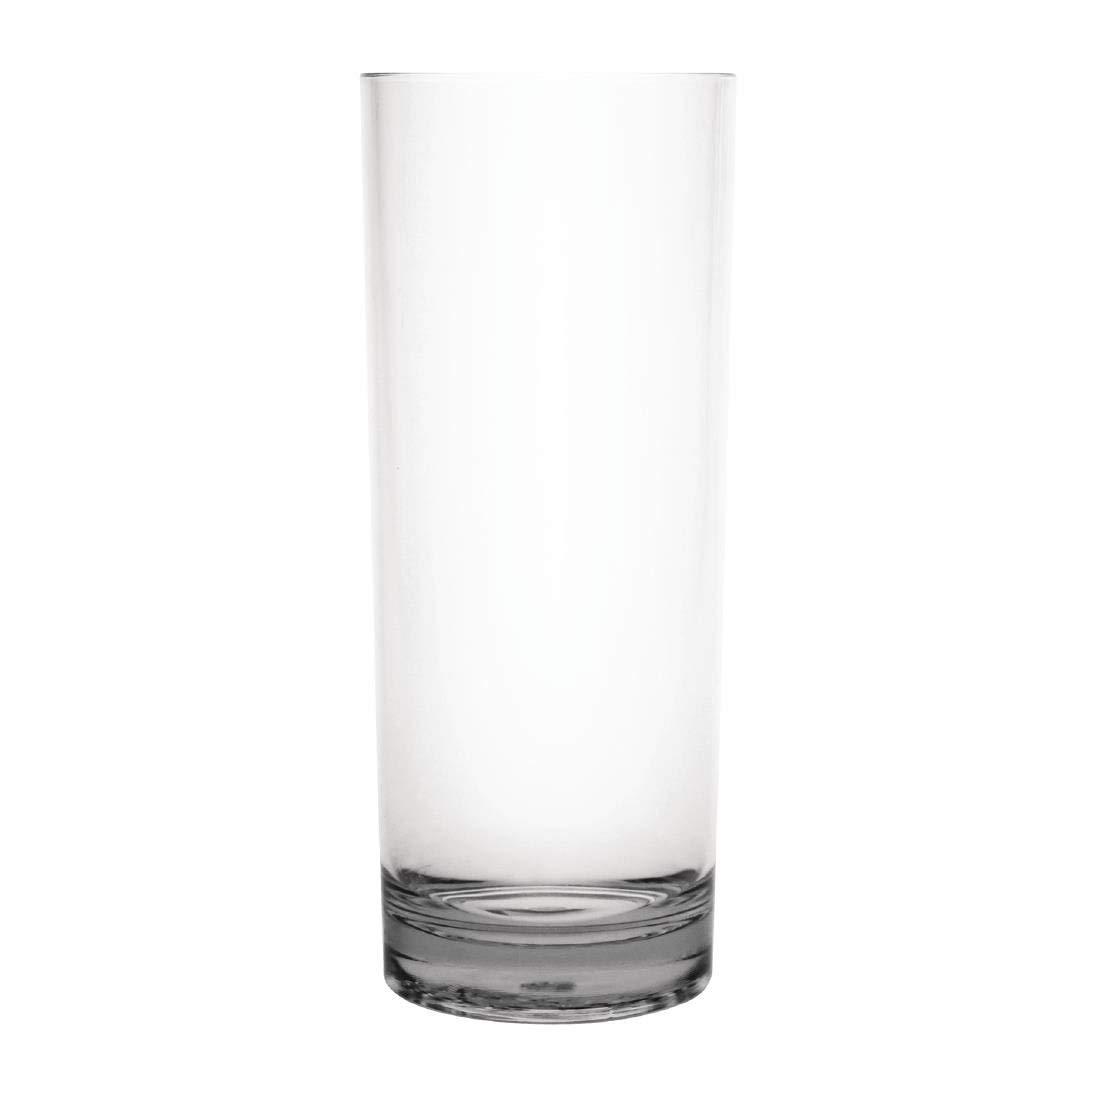 360/ml Pack de 6 Kristallon dc924/policarbonato Hiball Vaso transparente 12,75/oz